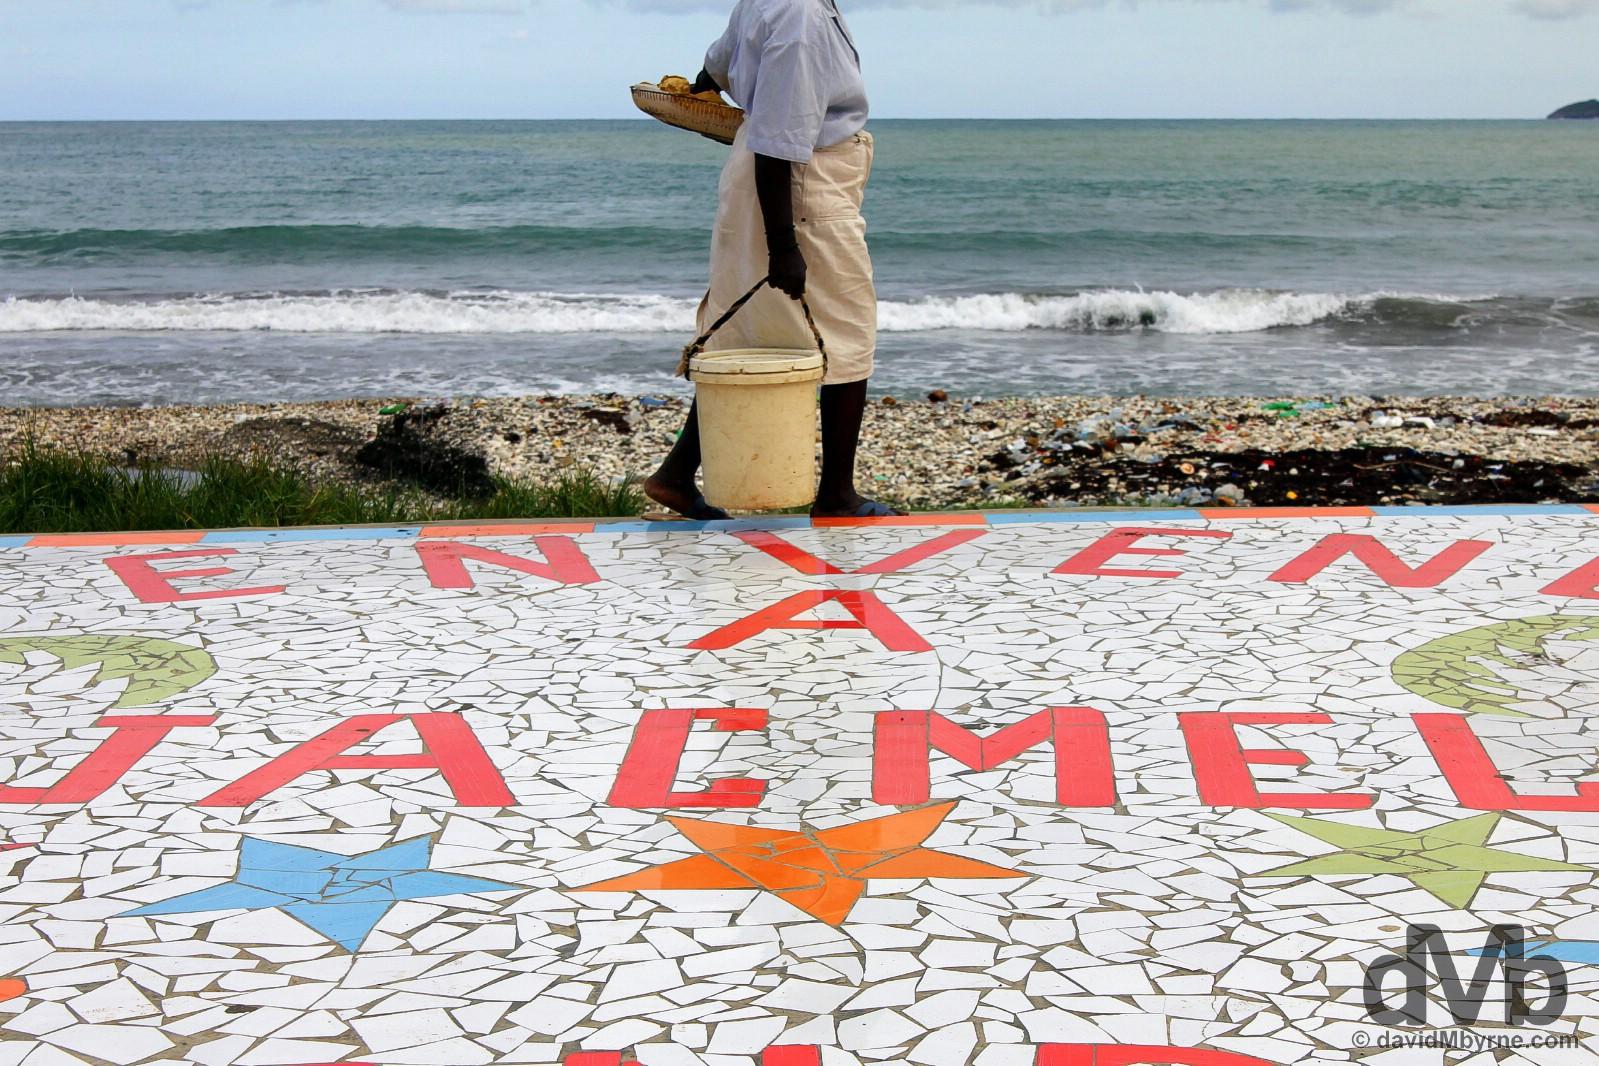 Down on the beachfront promenade in Jacmel, Haiti. May 19. 2015.